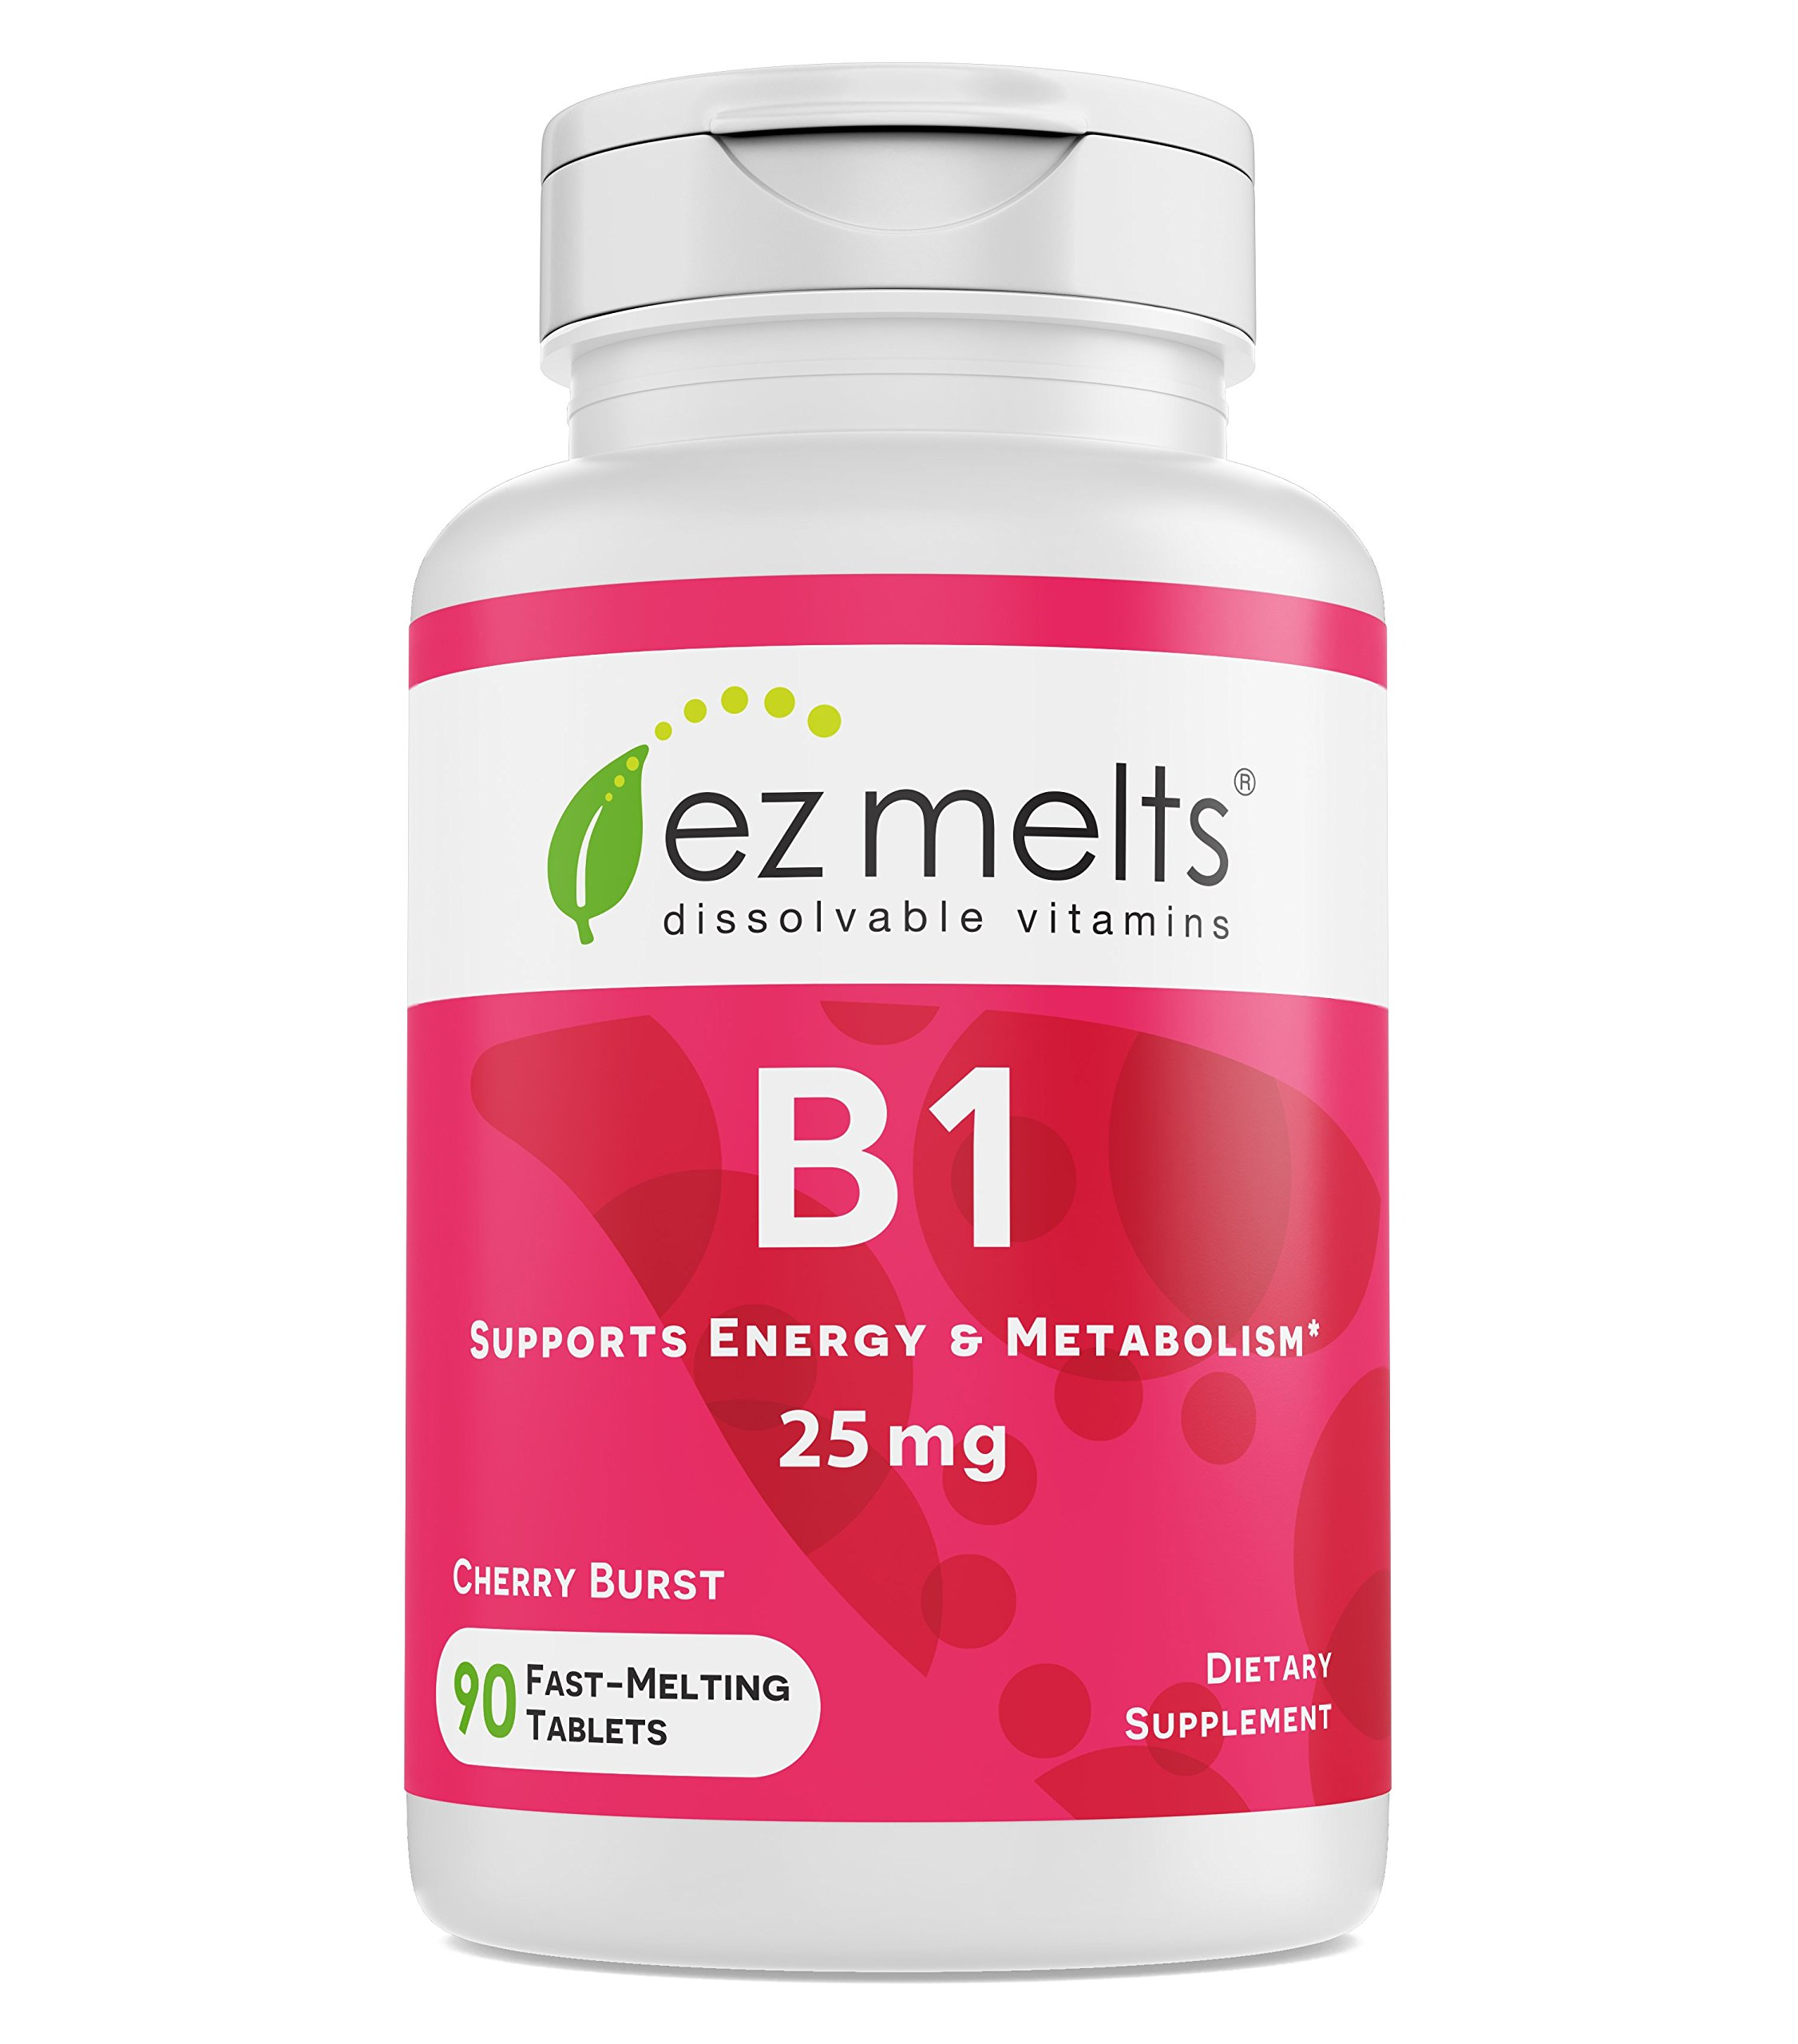 EZ Melts B1 as Thiamine, 25 mg, Sublingual Vitamins, Vegan, Zero Sugar, Natural Cherry Flavor, 90 Fast Dissolve Tablets